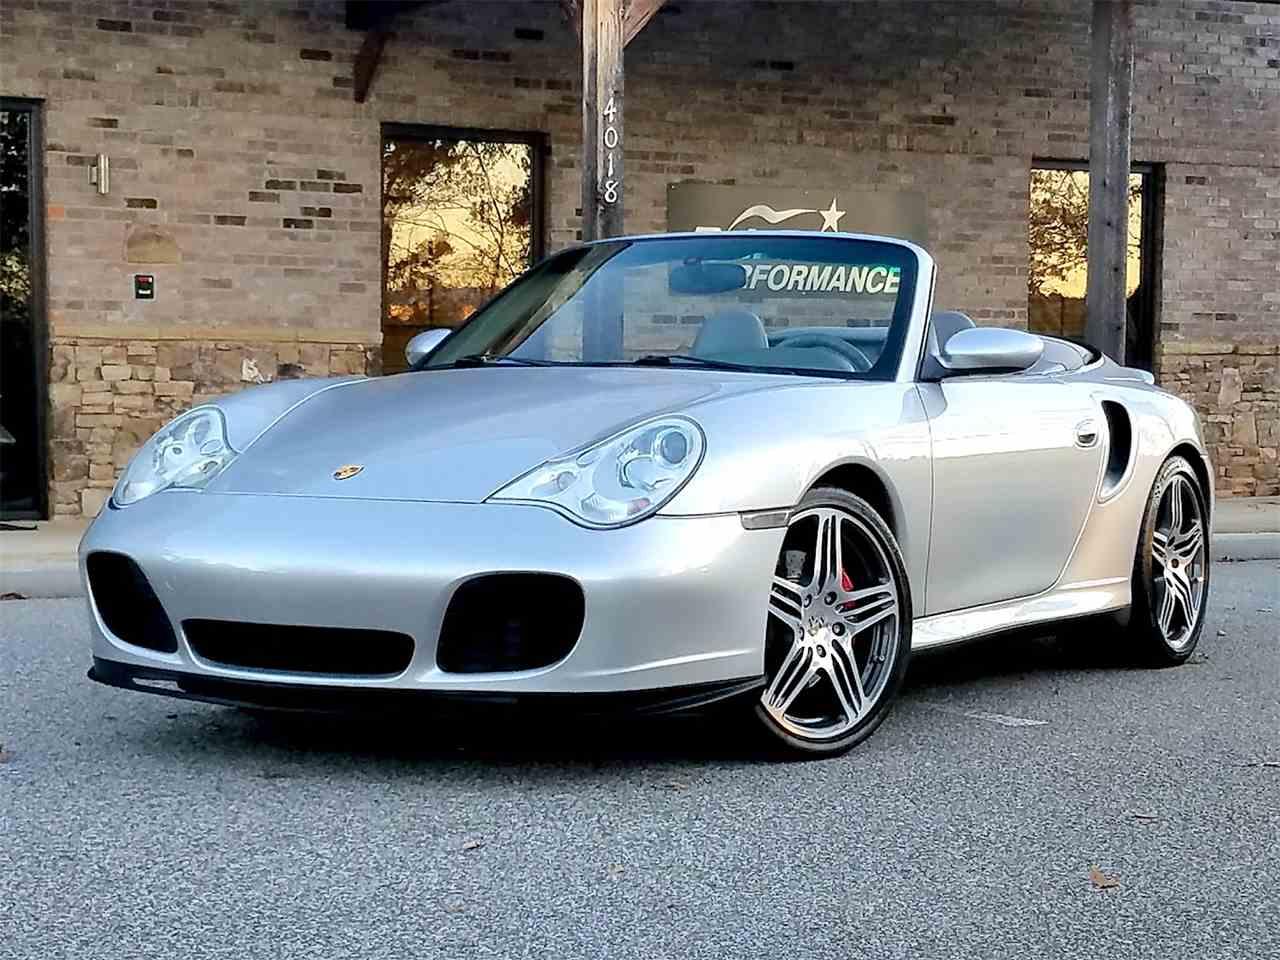 Large Picture of '04 Porsche 911 Carrera Turbo located in Oakwood Georgia - $55,000.00 - MCDK